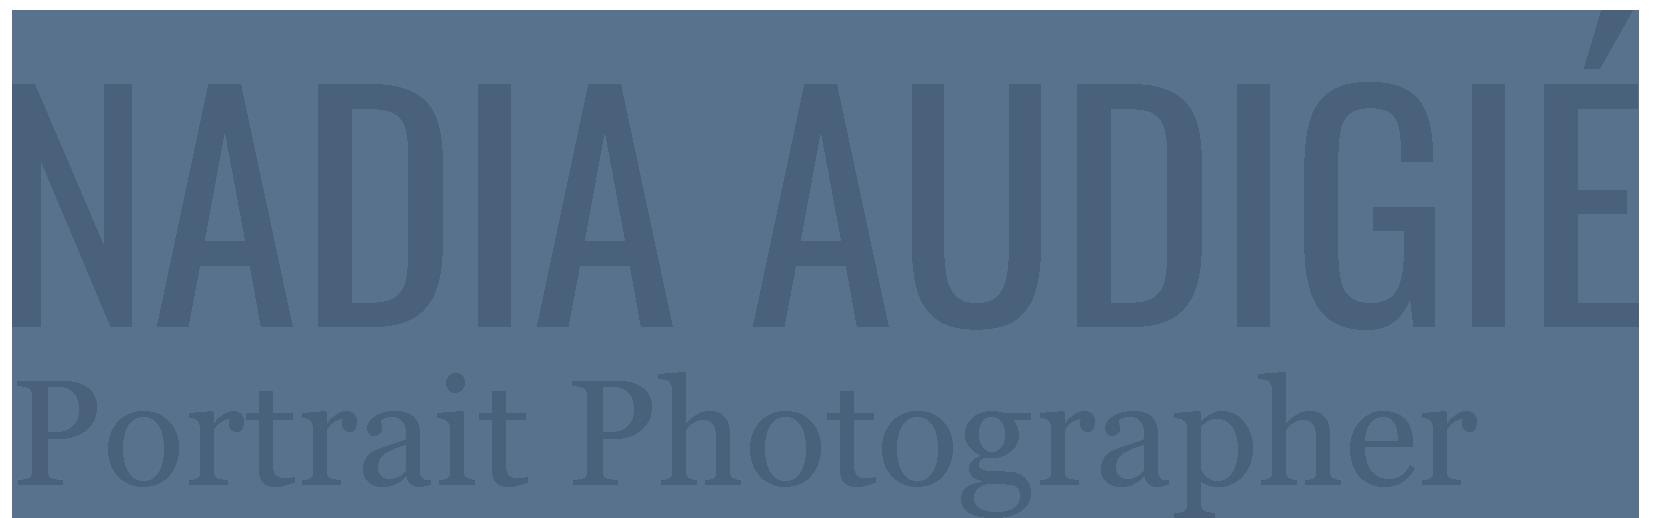 ENG- Blue - Left Align- Nadia Audigie Photographer - Portrait Photographer Strasbourg Alsace